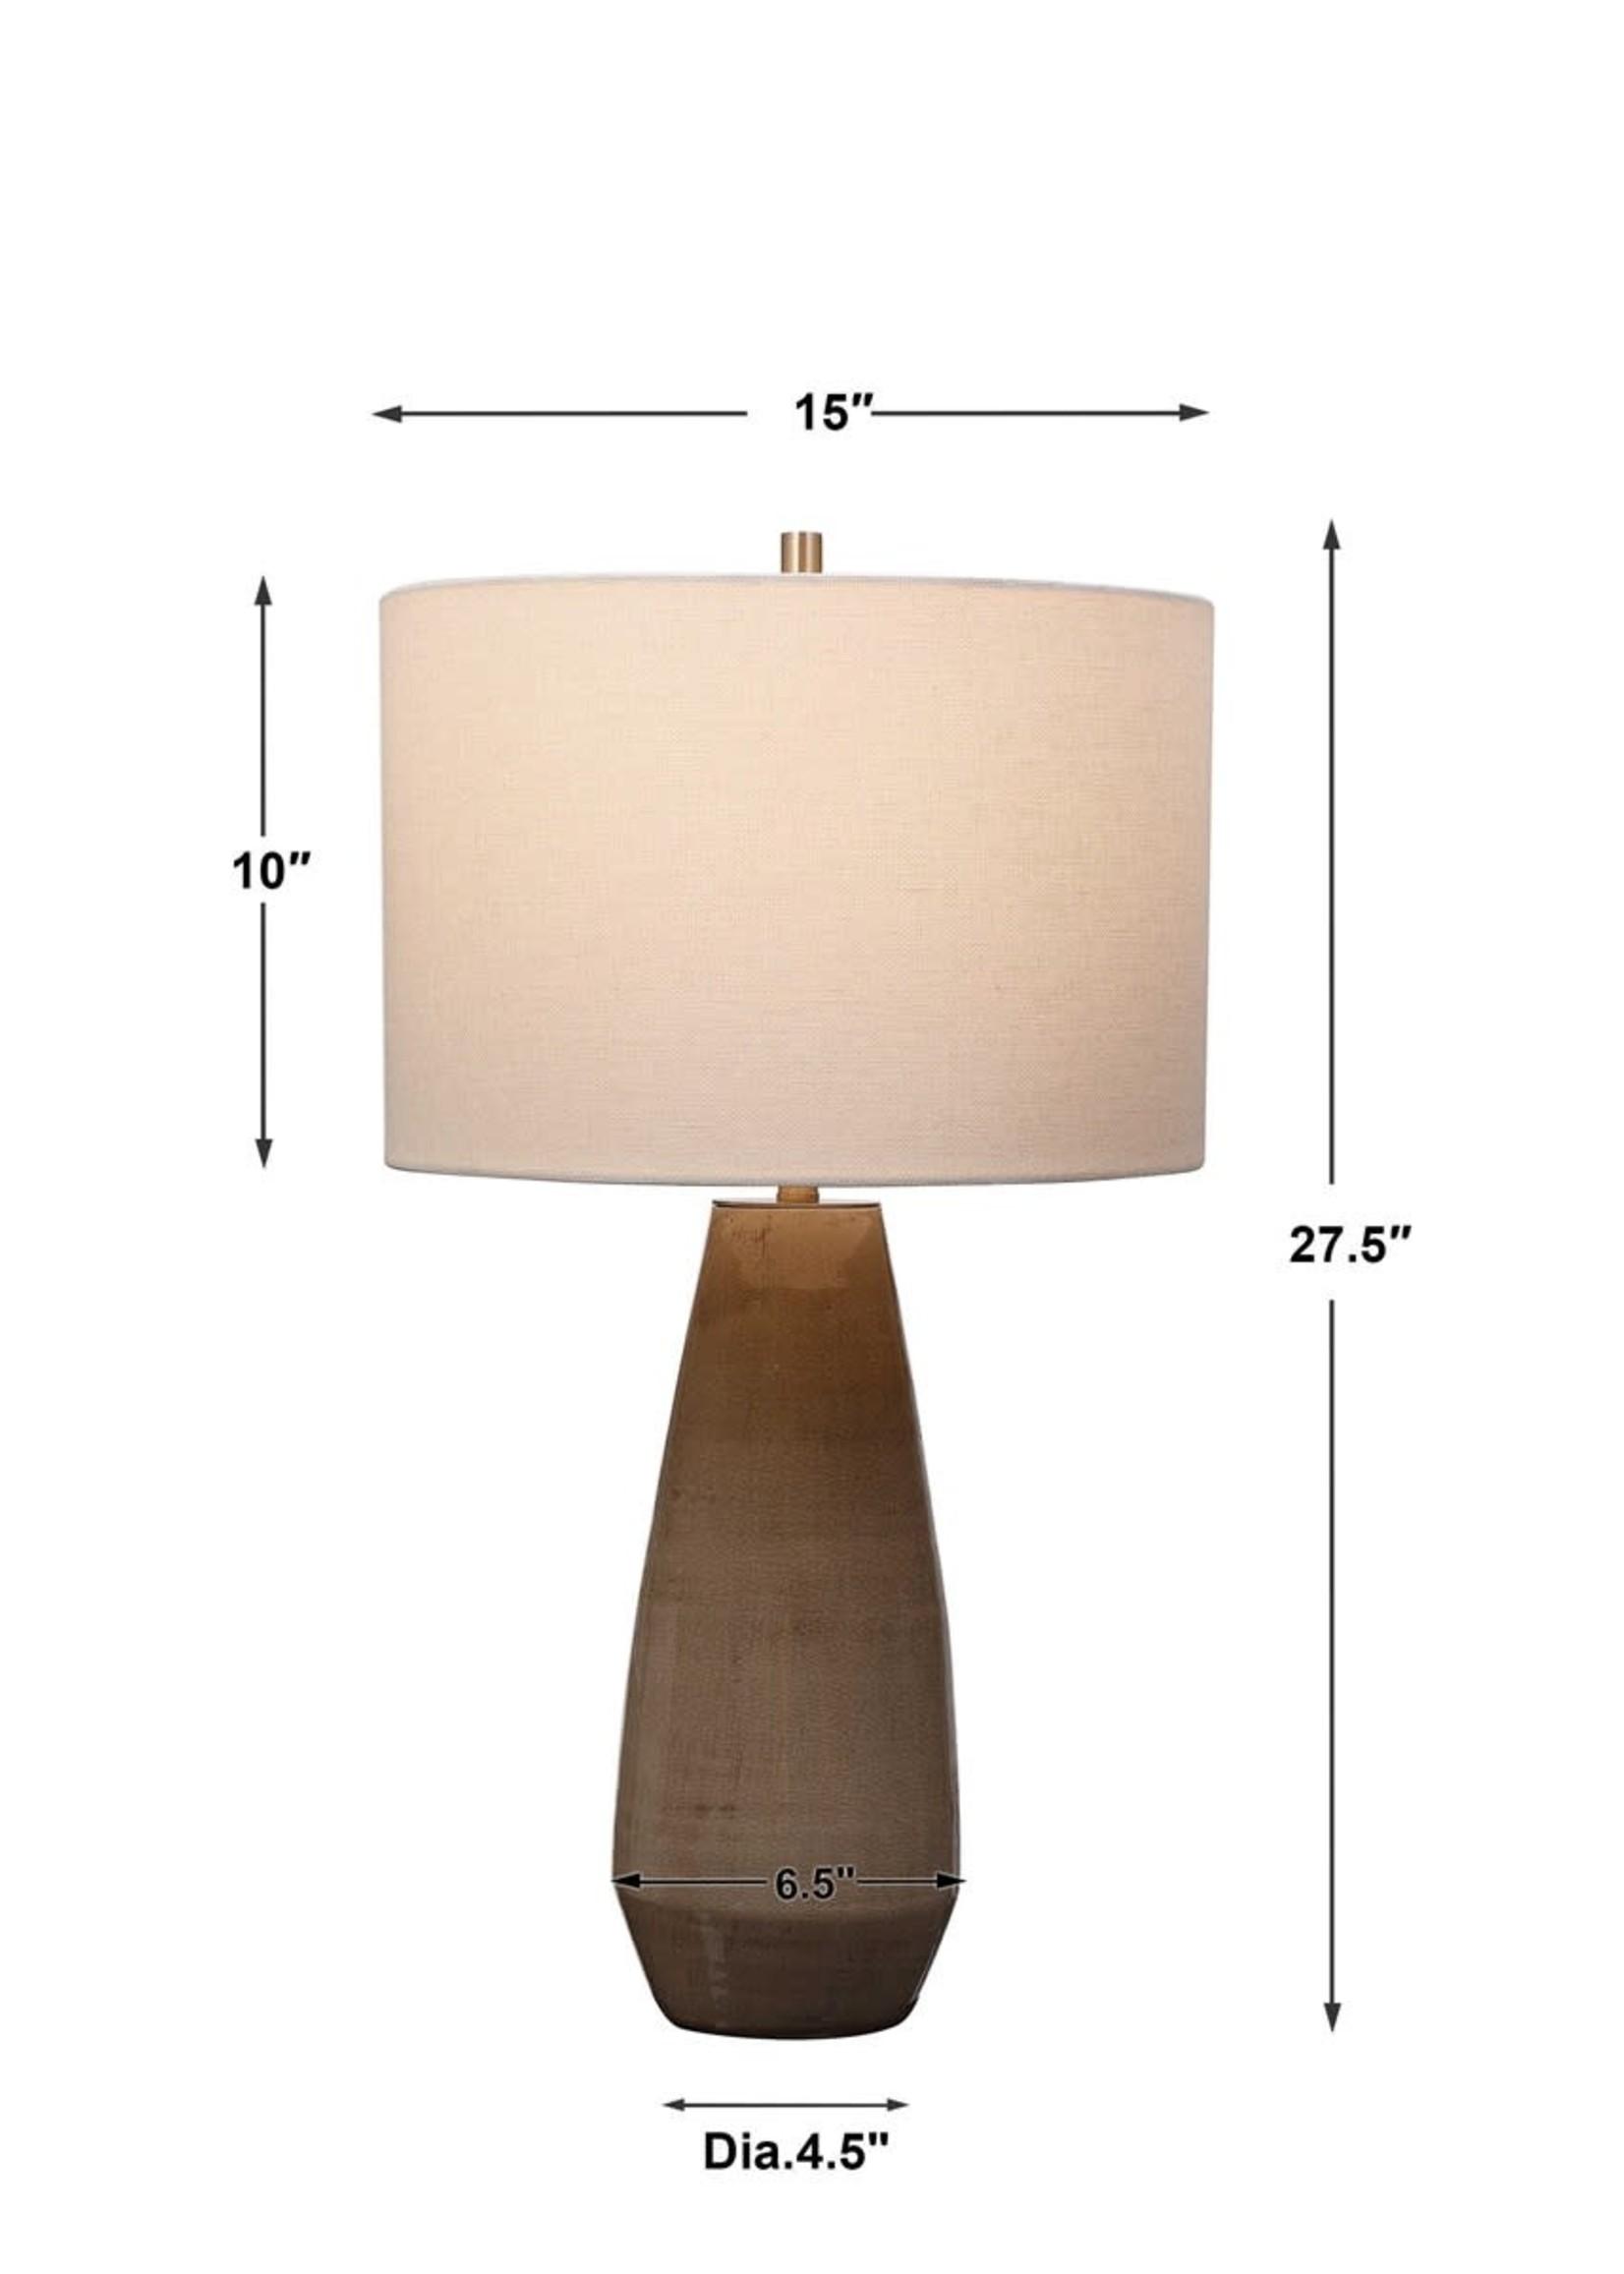 VLOTERRA TABLE LAMP